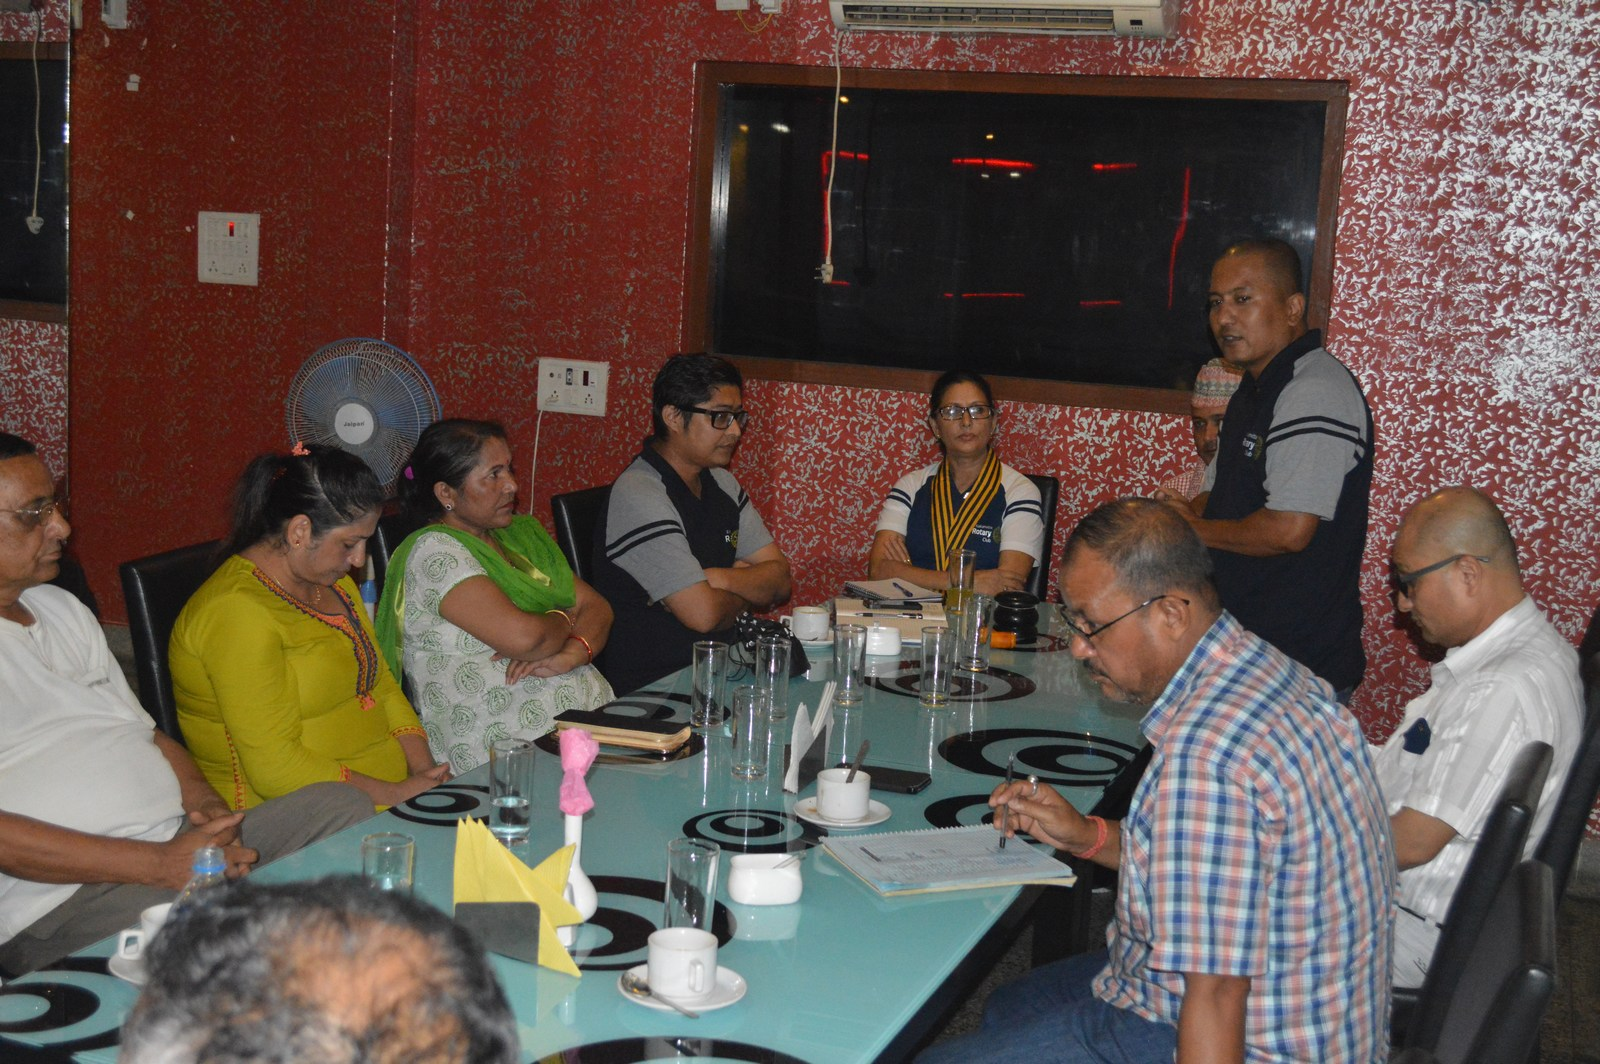 Weekly-Meeting-with-the-Guest-Speaker-DSP-Durga-Raj-Regmi-Rotary-Club-of-Kakarvitta-8